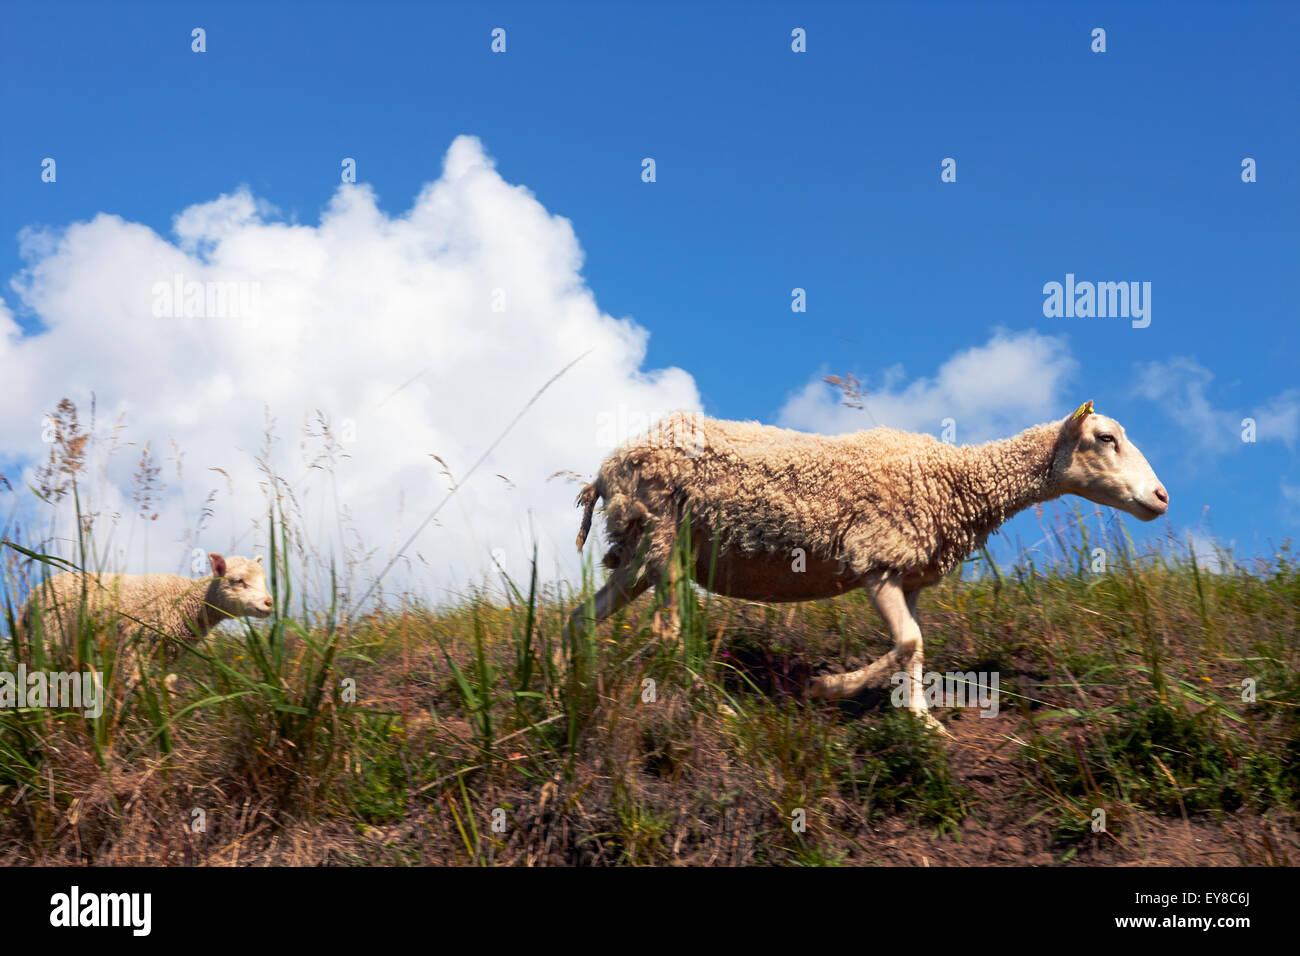 lamb and ewe in meadow - Stock Image